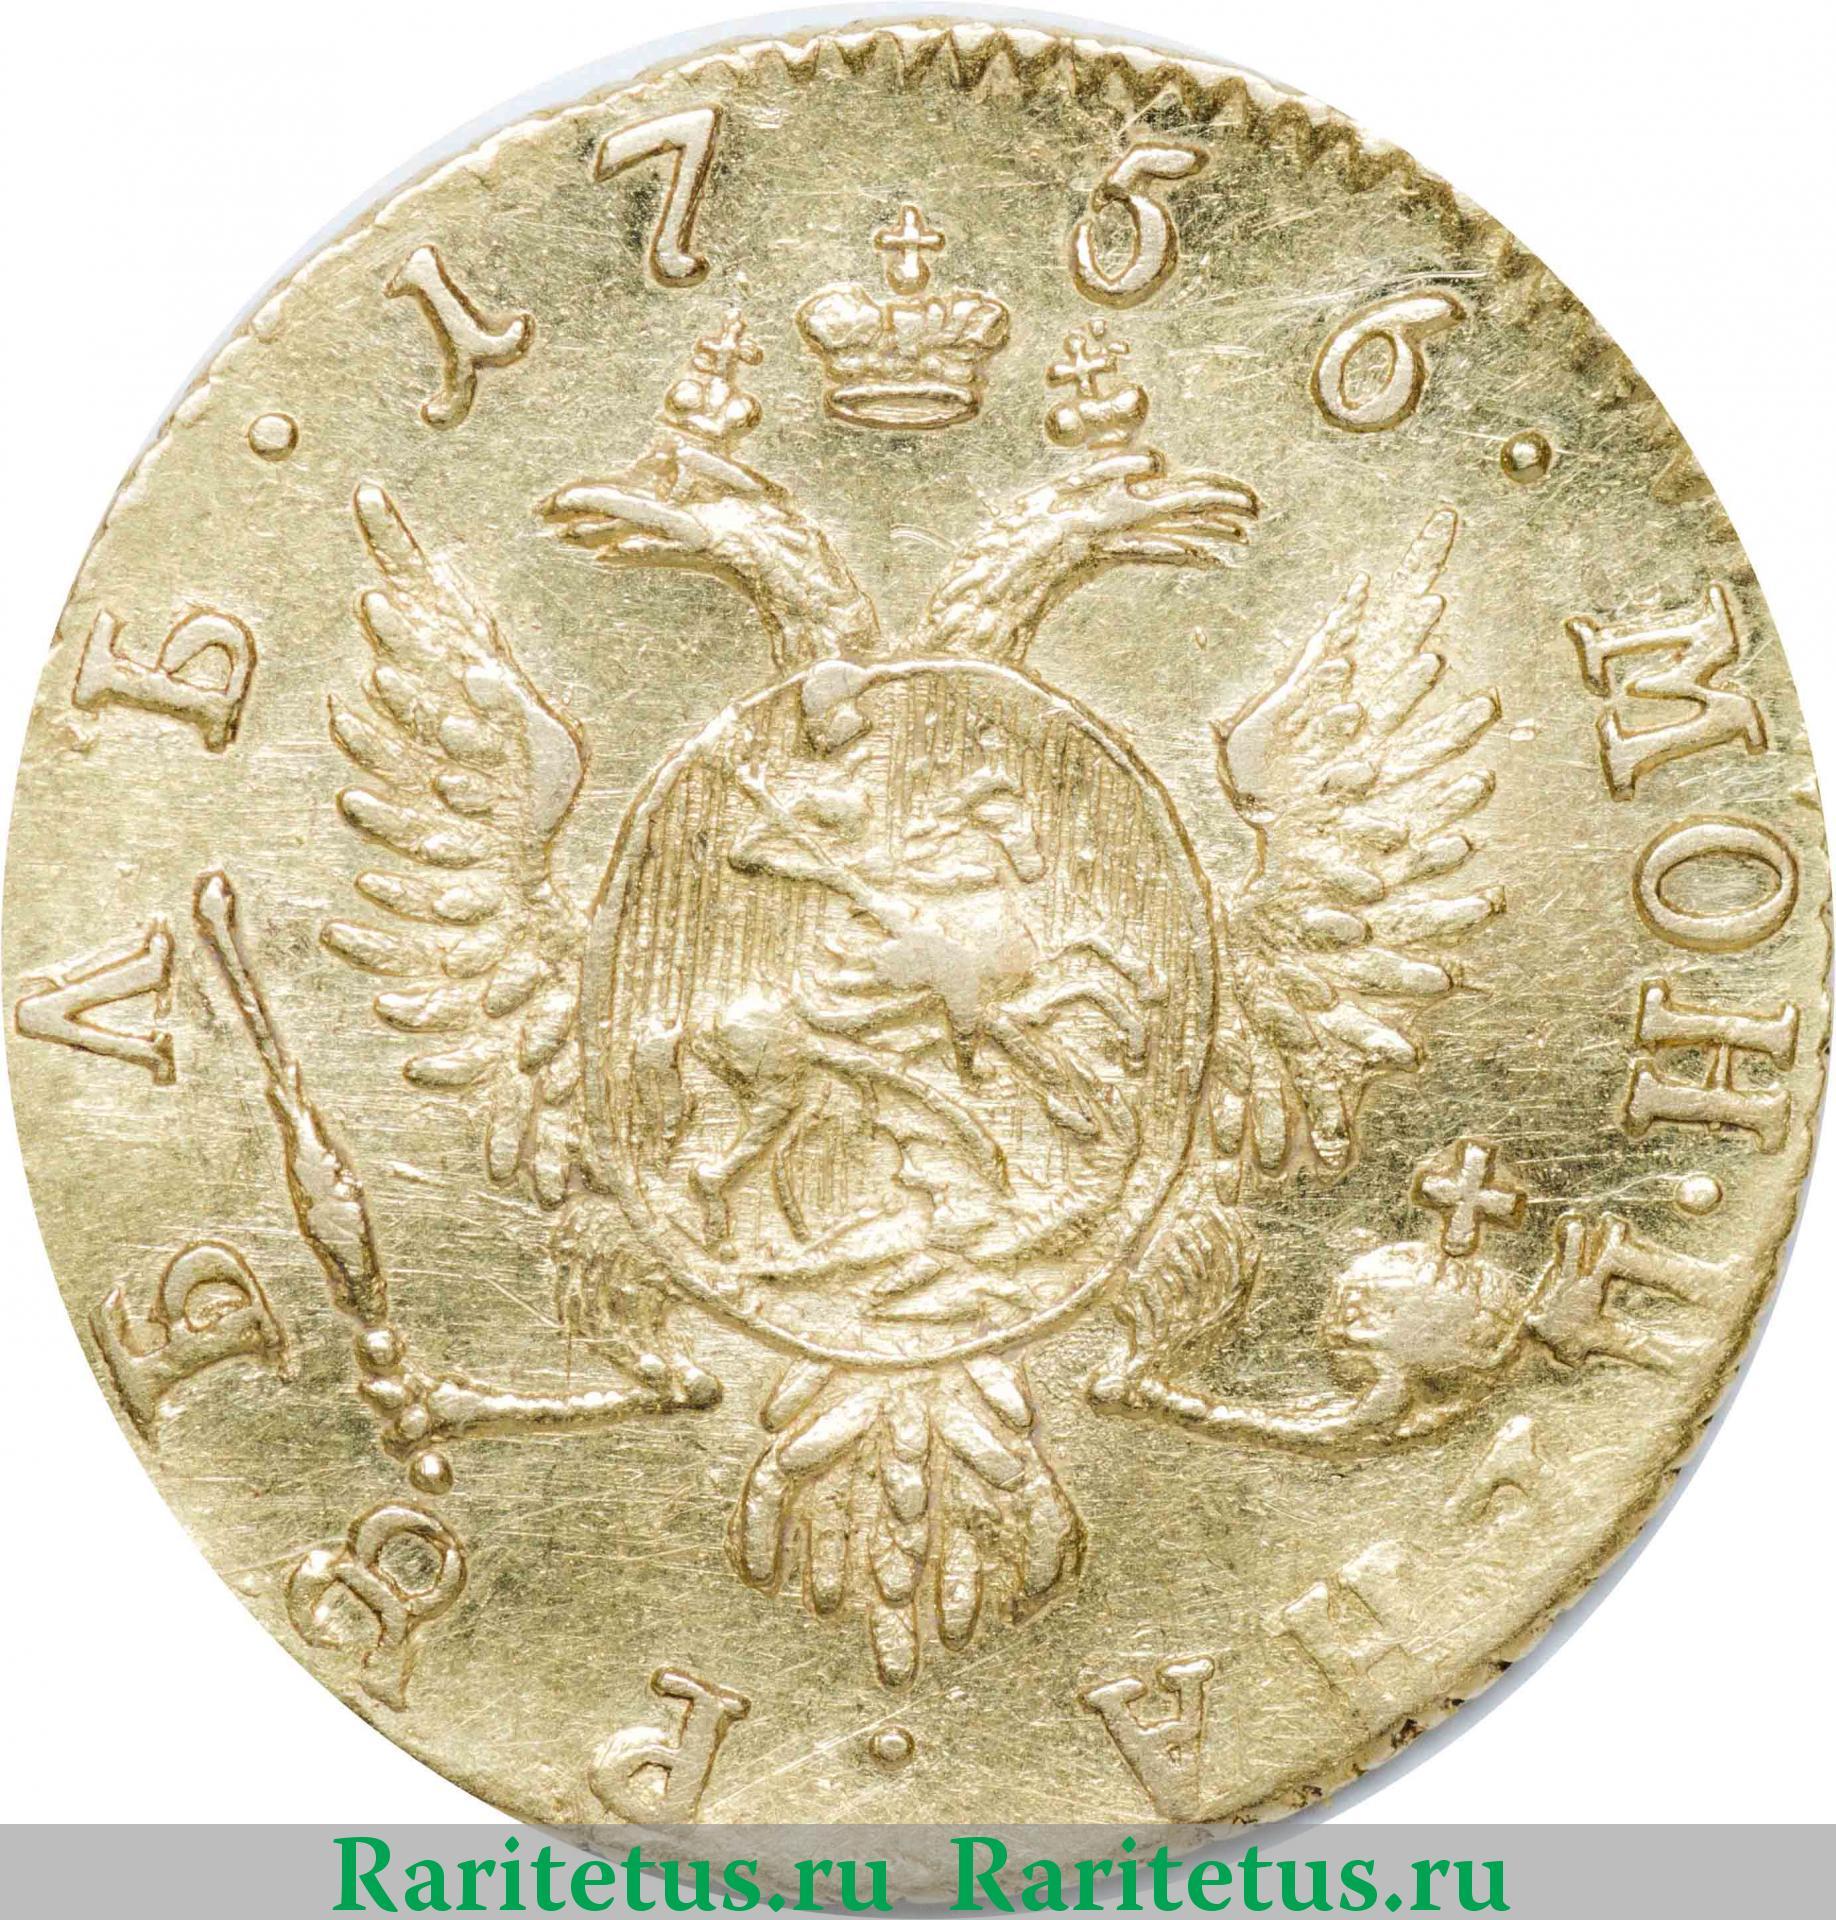 Монета золотая царская рубль индия 5 рупий